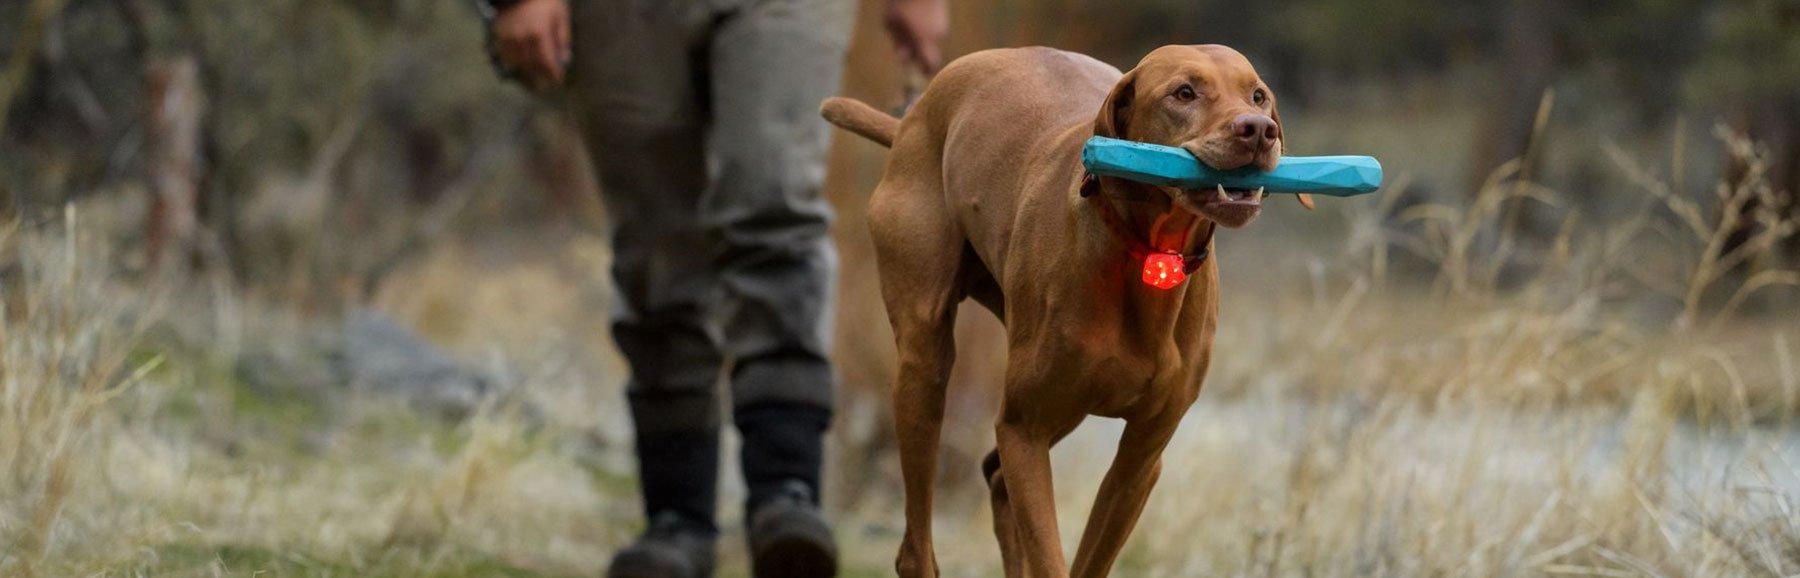 Ruffwear Hundespielzeug, Bild 2